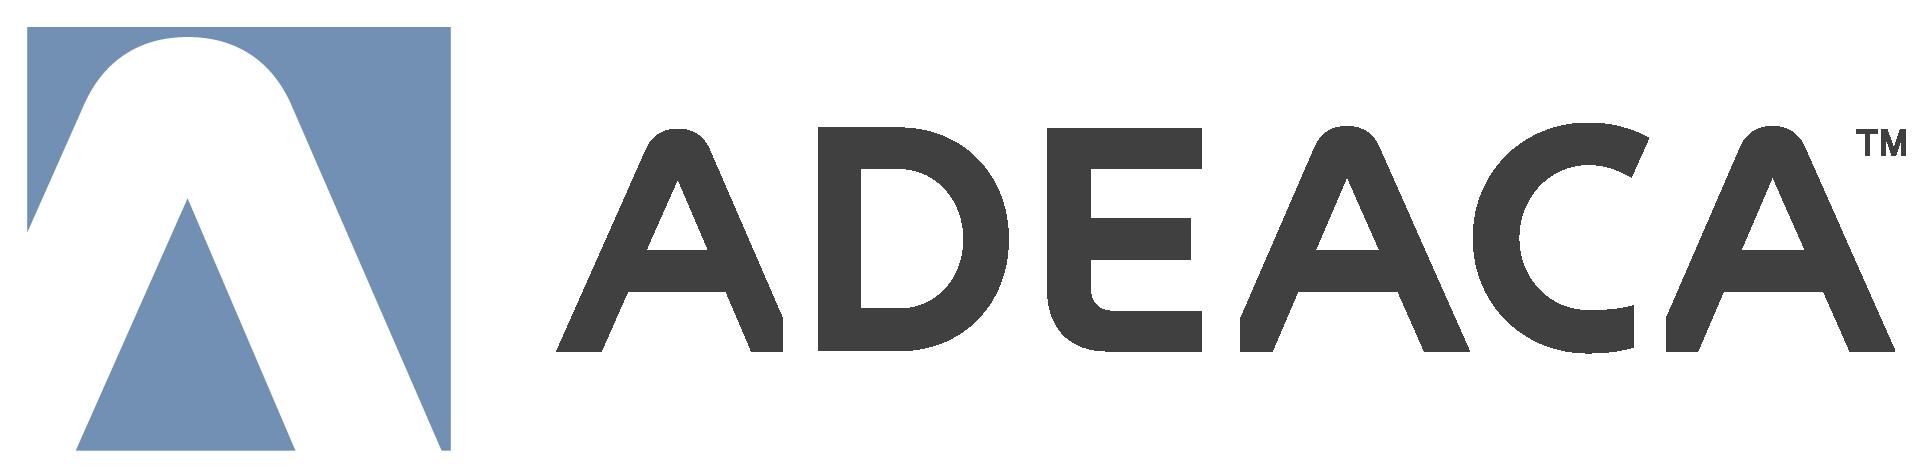 Project Business Automation Advances with Henrik Lerkenfeld of Adeaca